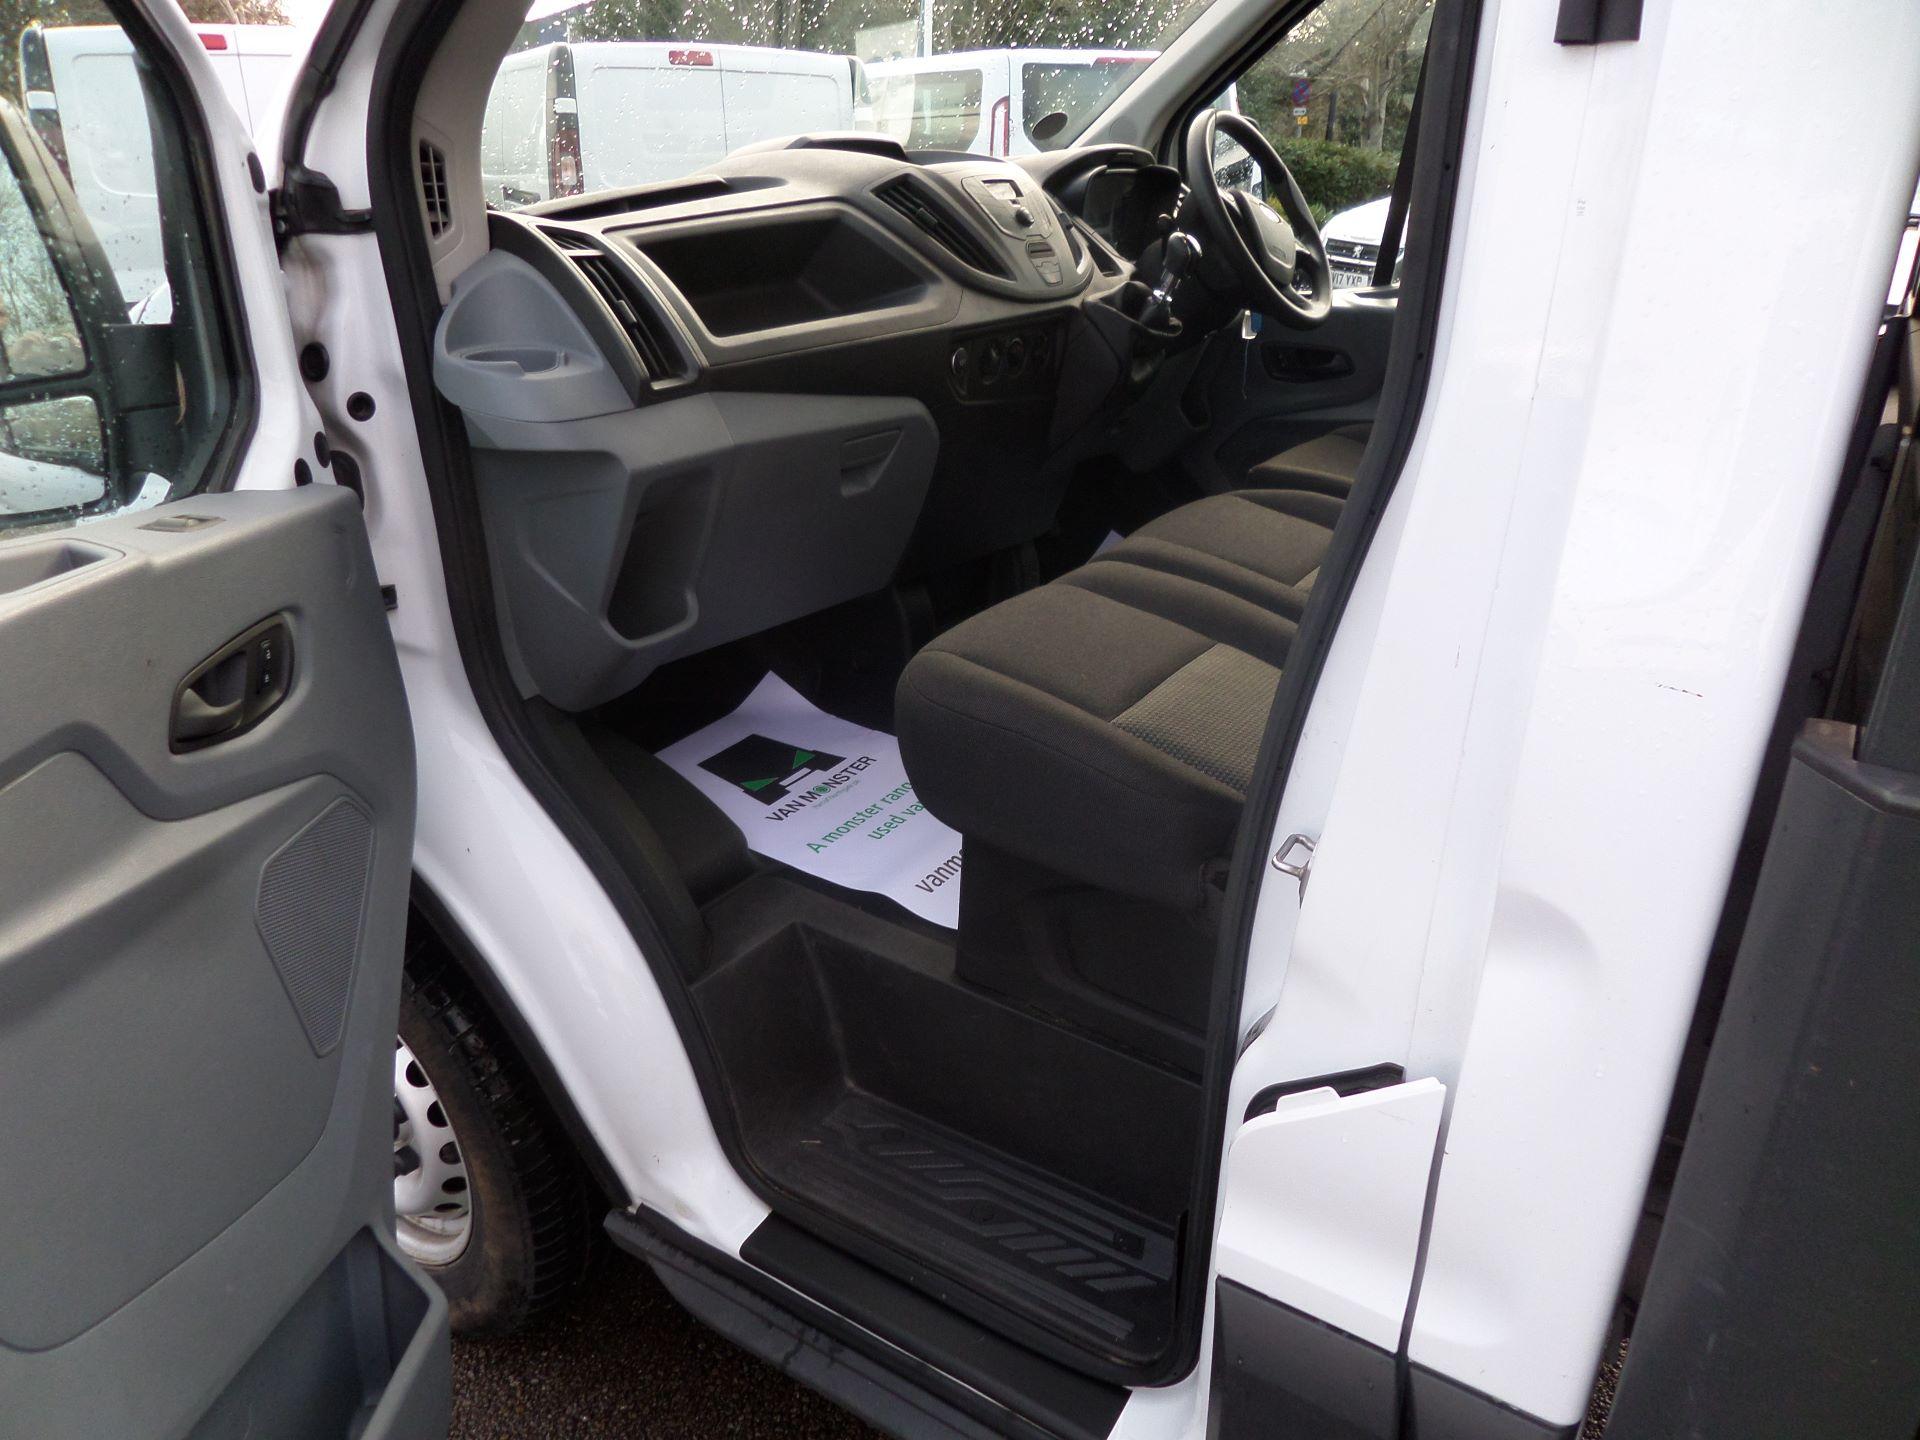 2018 Ford Transit 2.0 Tdci 130Ps Dropside Euro 6 (BK18JUT) Image 6